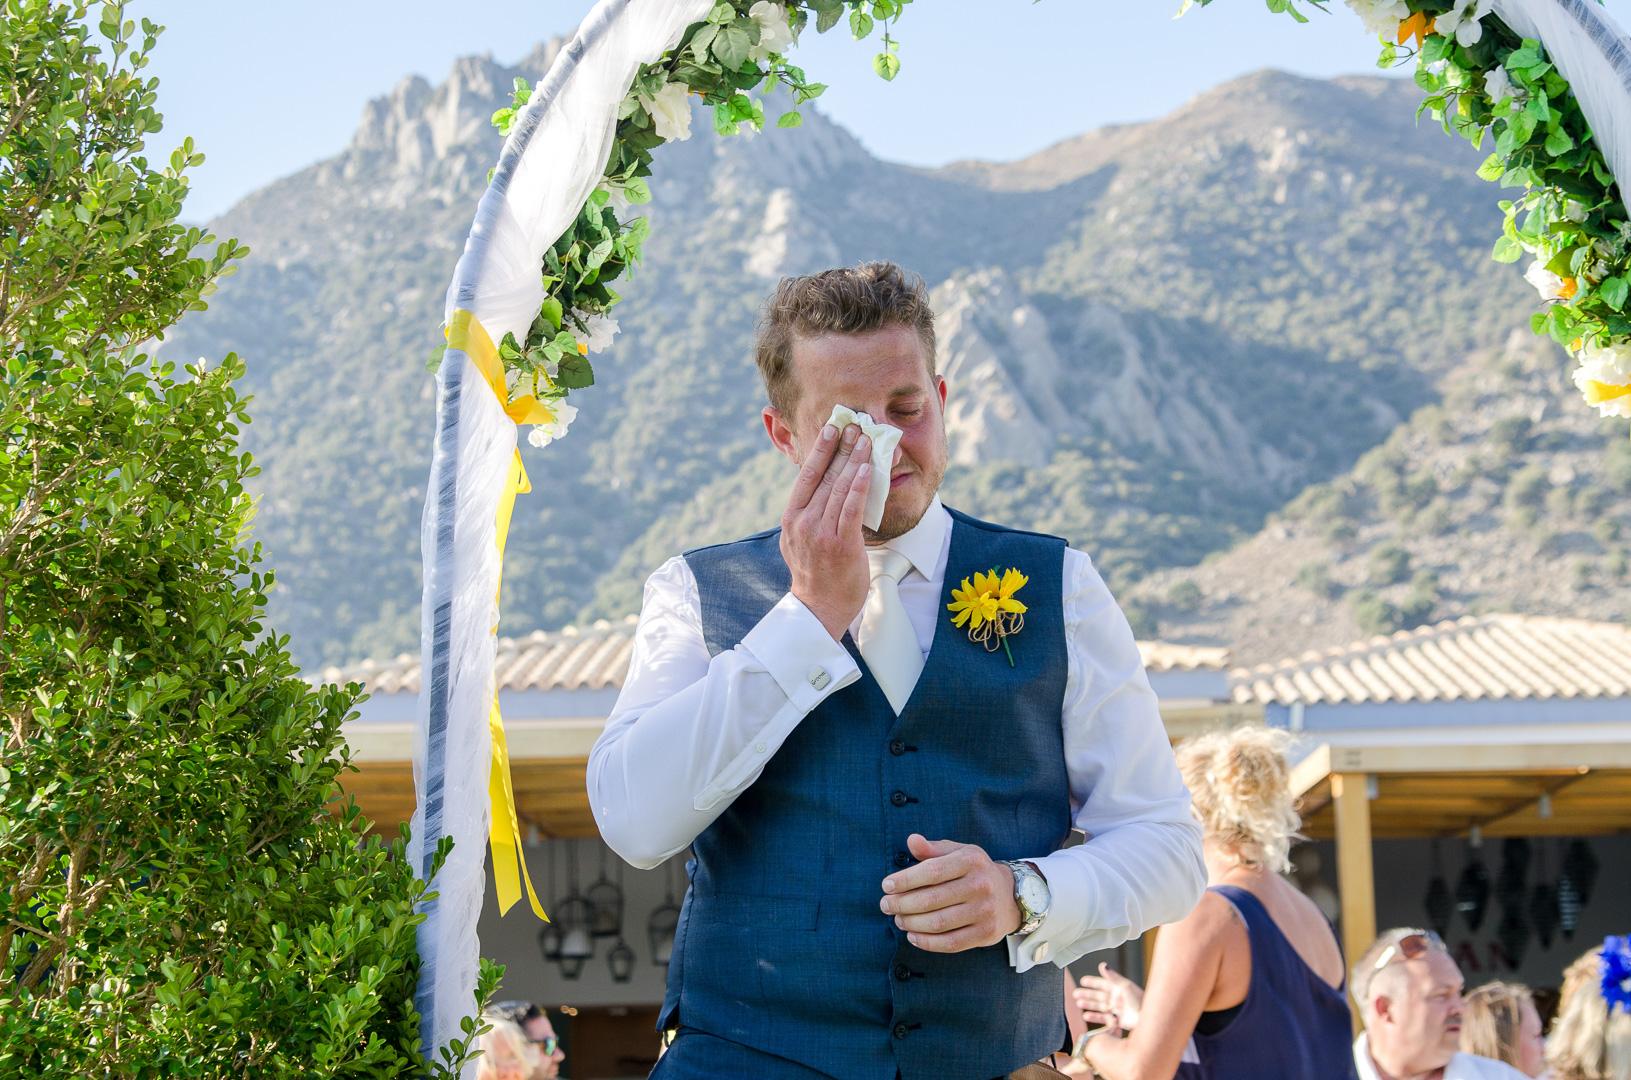 Wedding photo in Kos island, Blue Dome Mitsis hotel